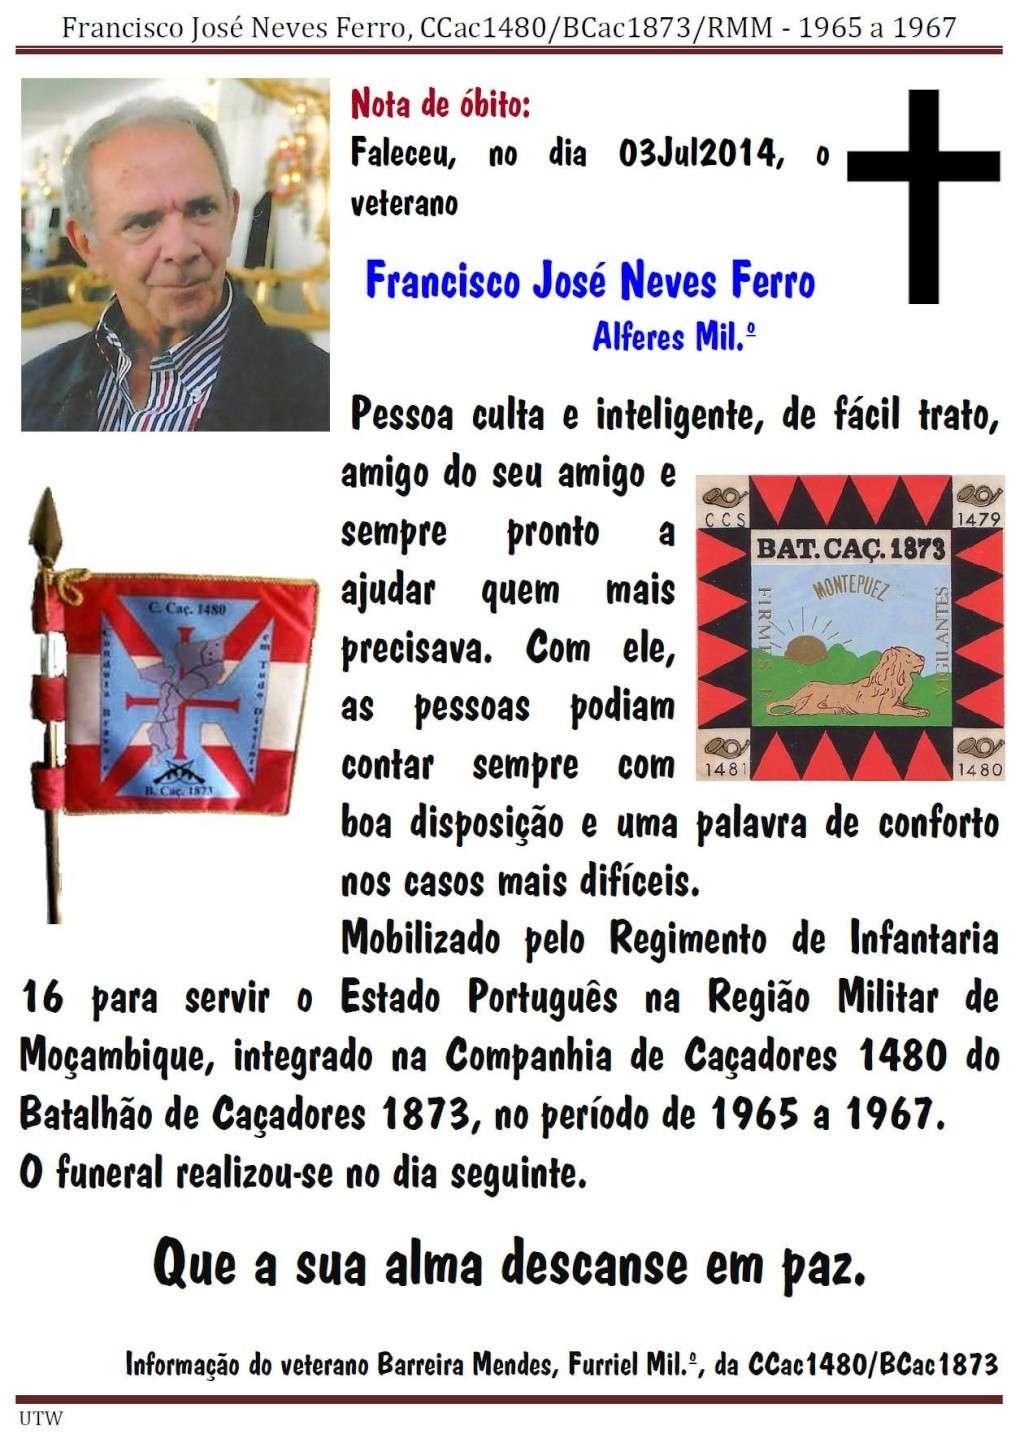 Faleceu o veterano Francisco José Neves Ferro, Alferes Mil.º, da CCac1480/BCac1873 - 03Jul2014 Franci10